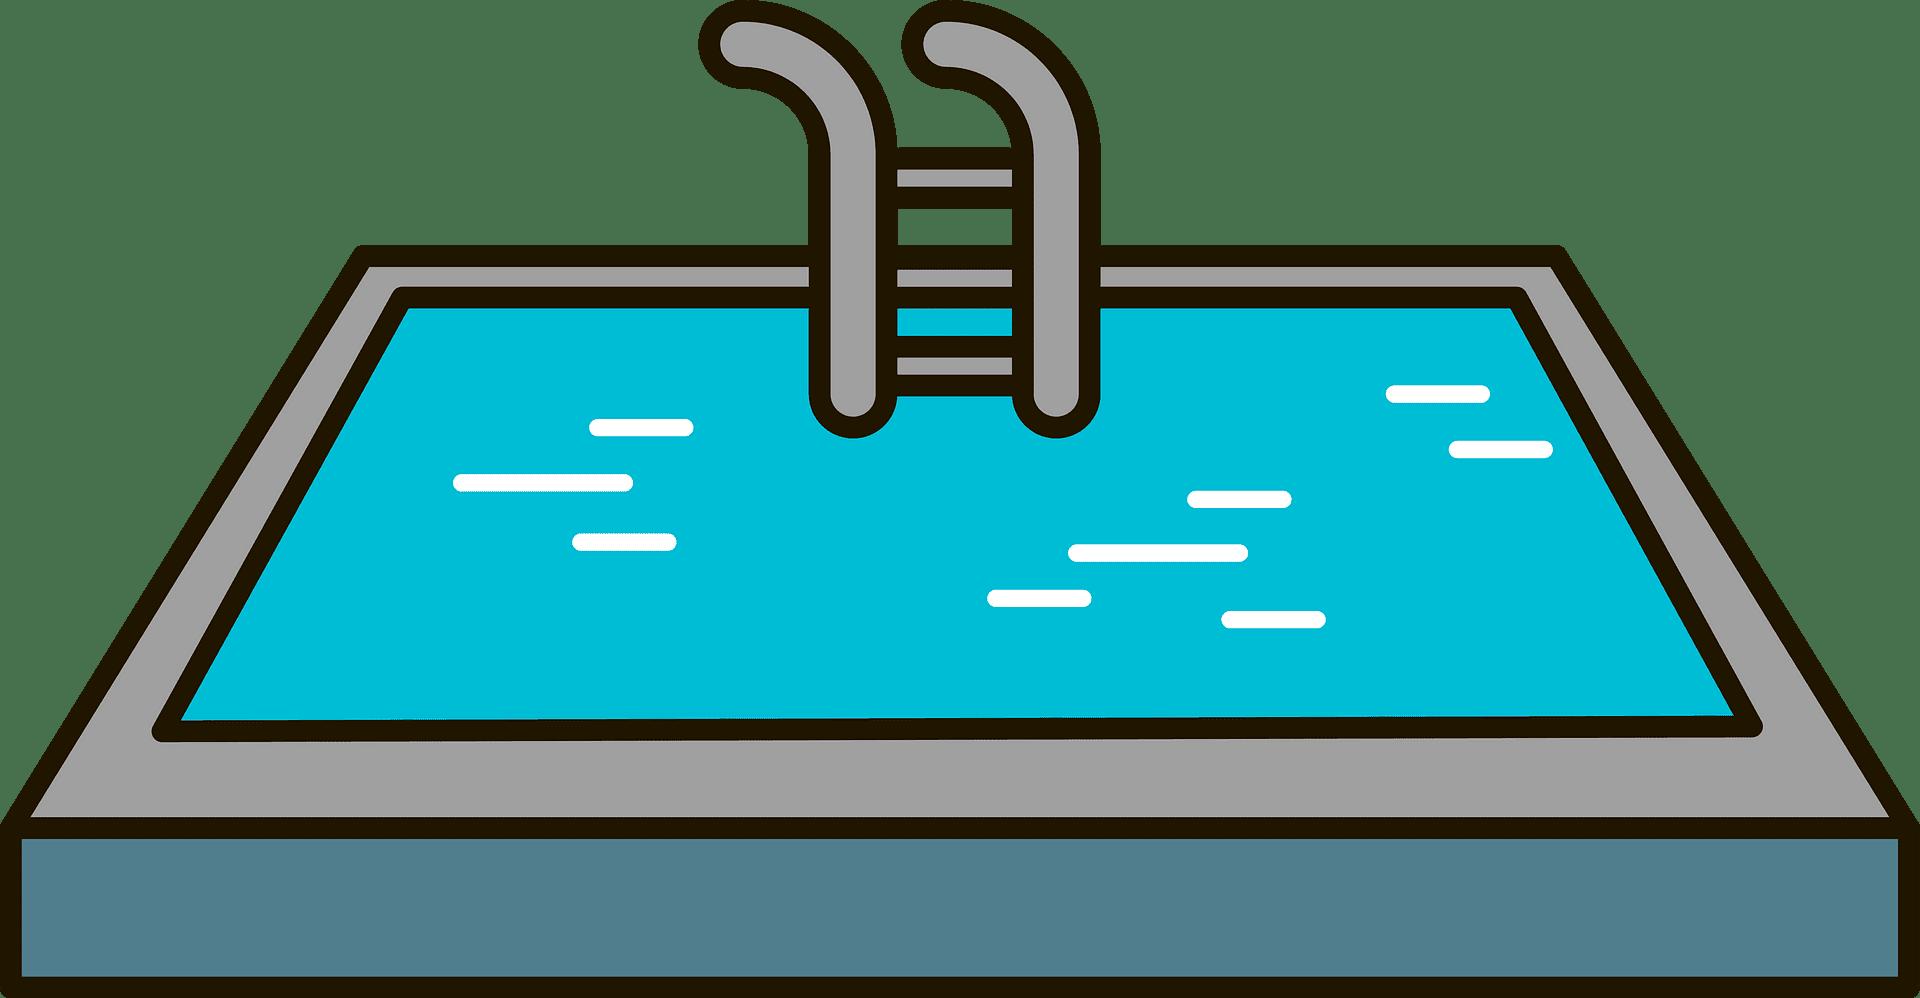 Swimming Pool clipart transparent 1